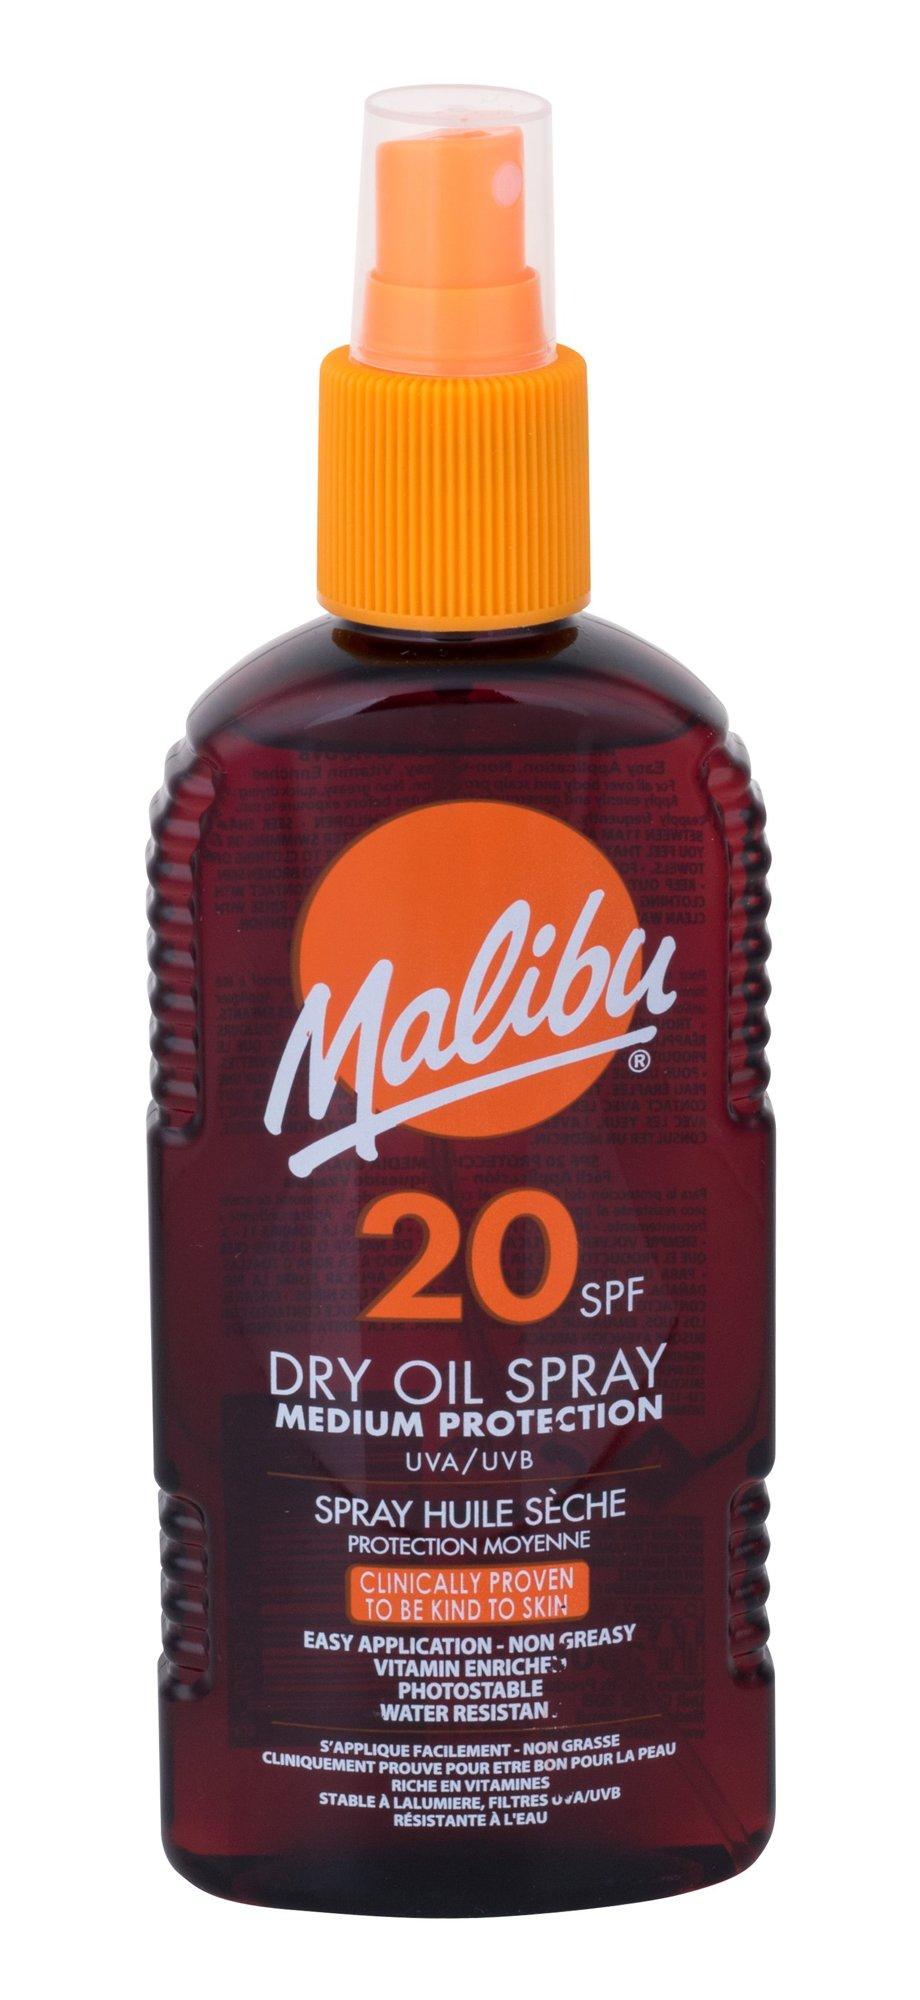 Malibu Dry Oil Spray Cosmetic 200ml